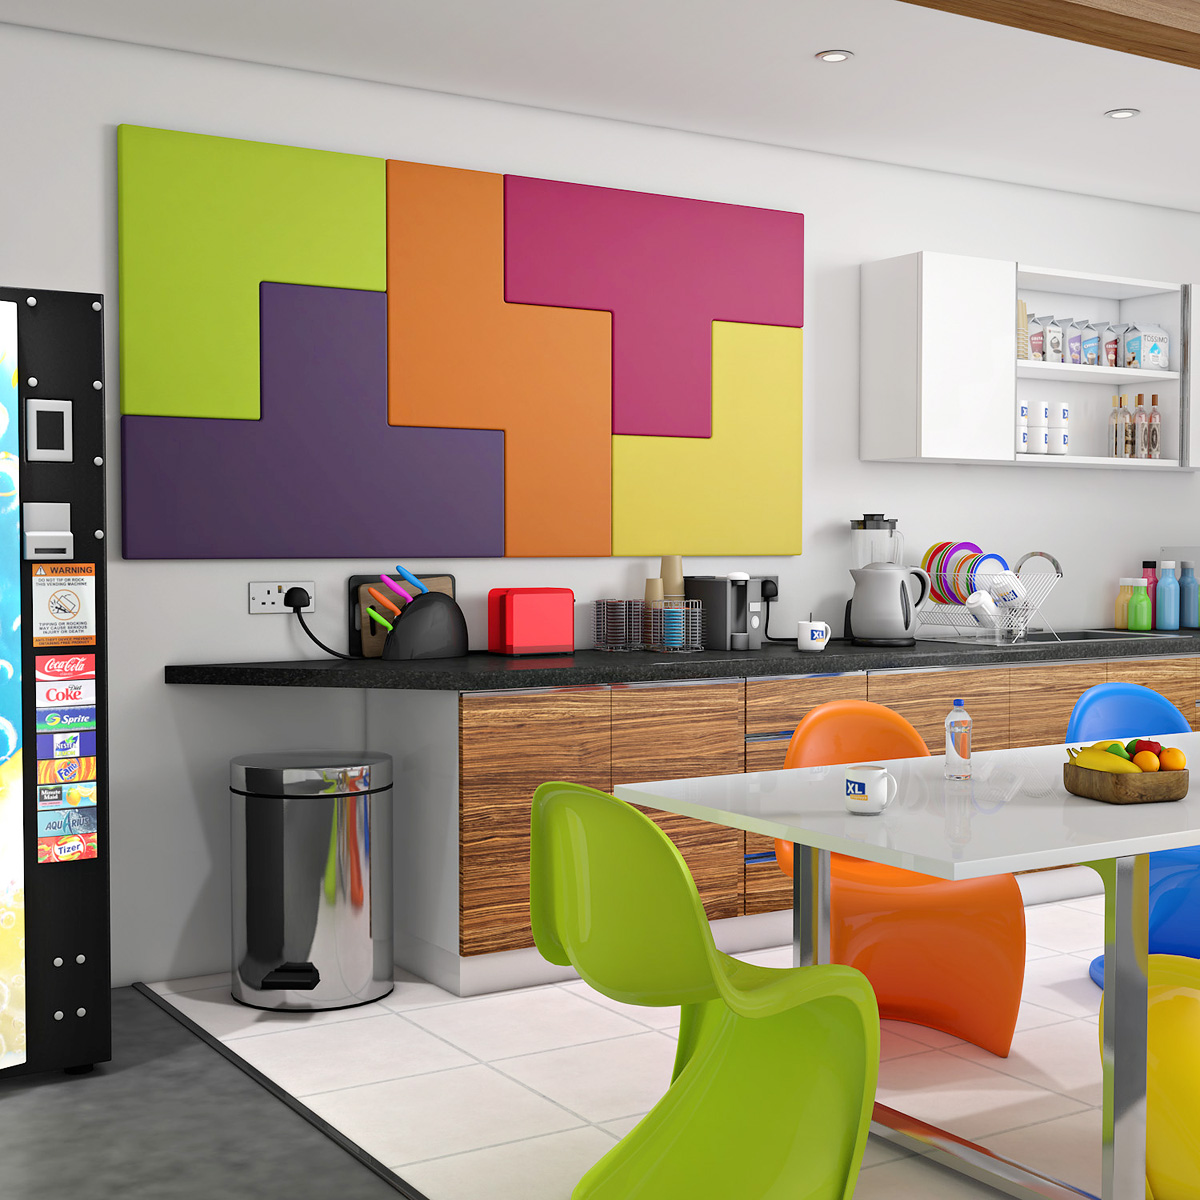 TETRATAK™ Interlocking Acoustic Soundproofing Wall Tile Panels